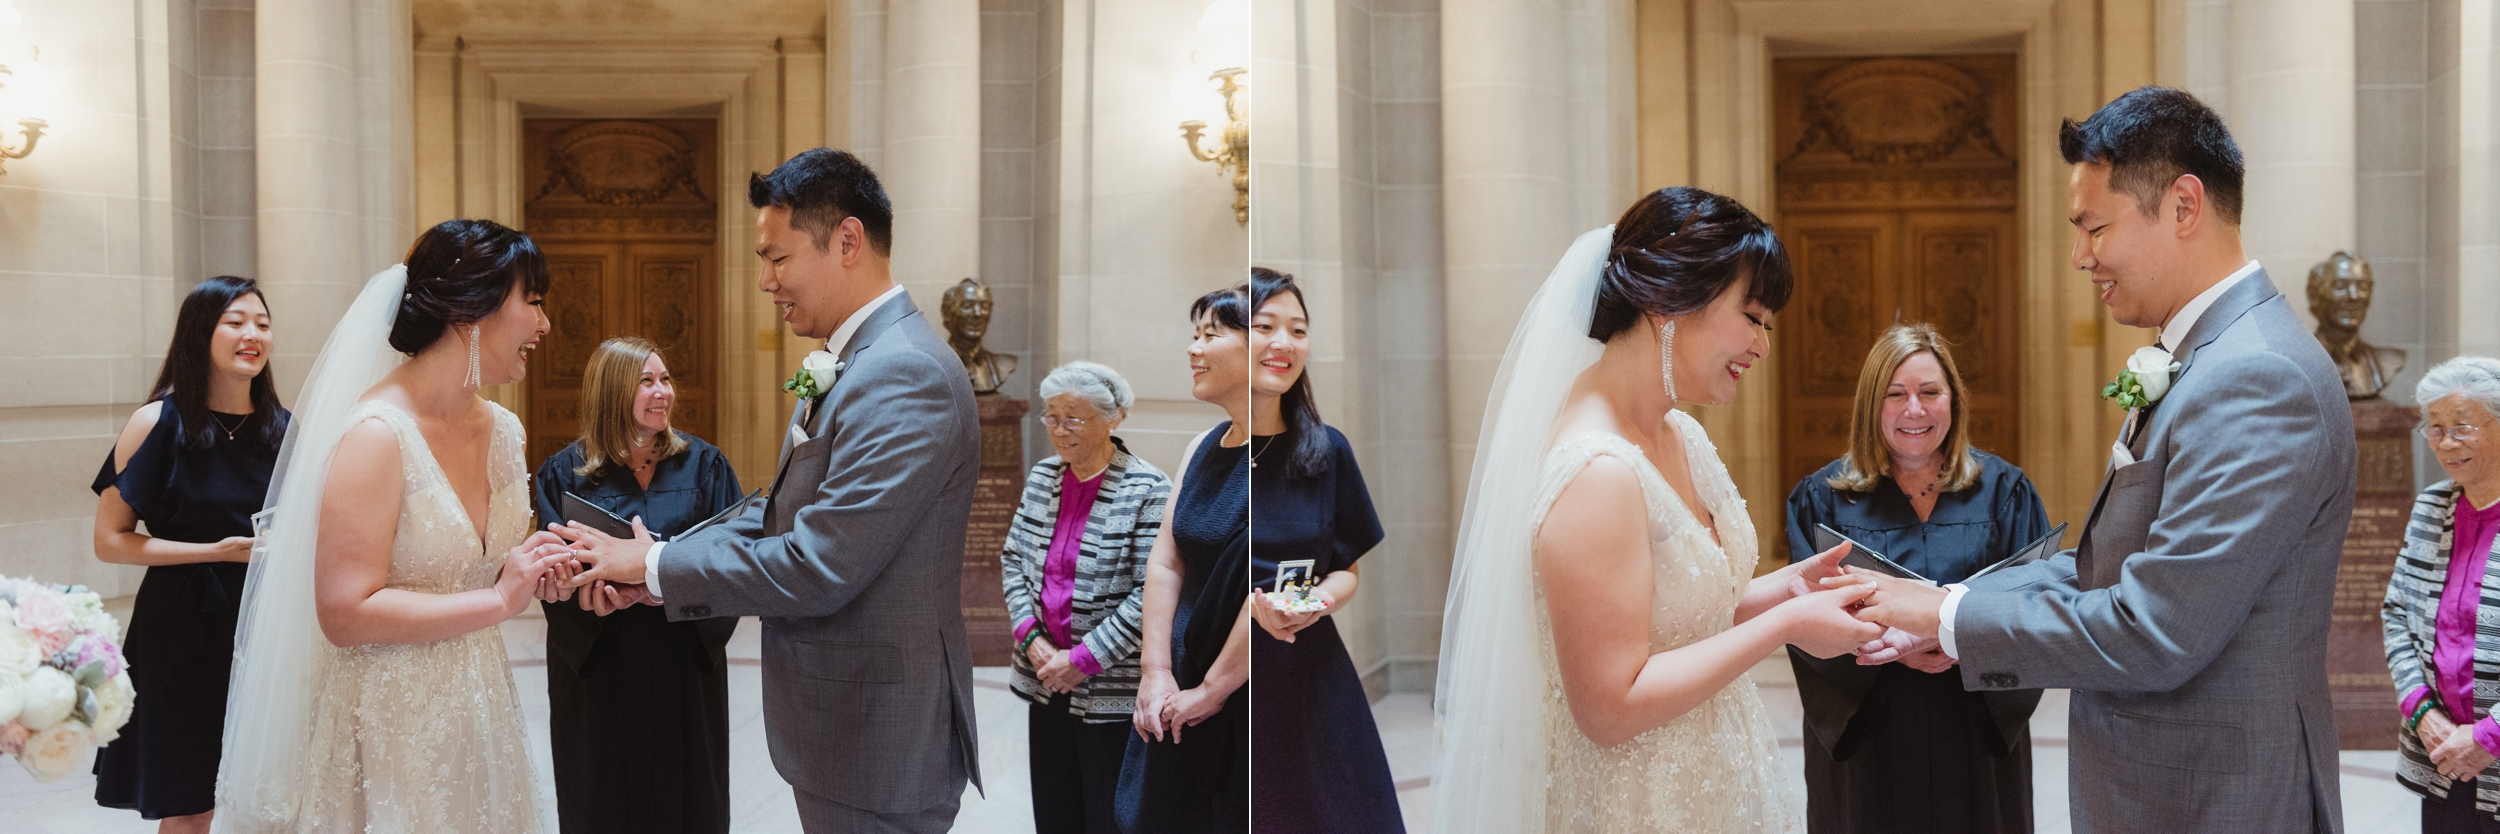 21-san-francisco-city-hall-elopement-photographer-vc_WEB.jpg